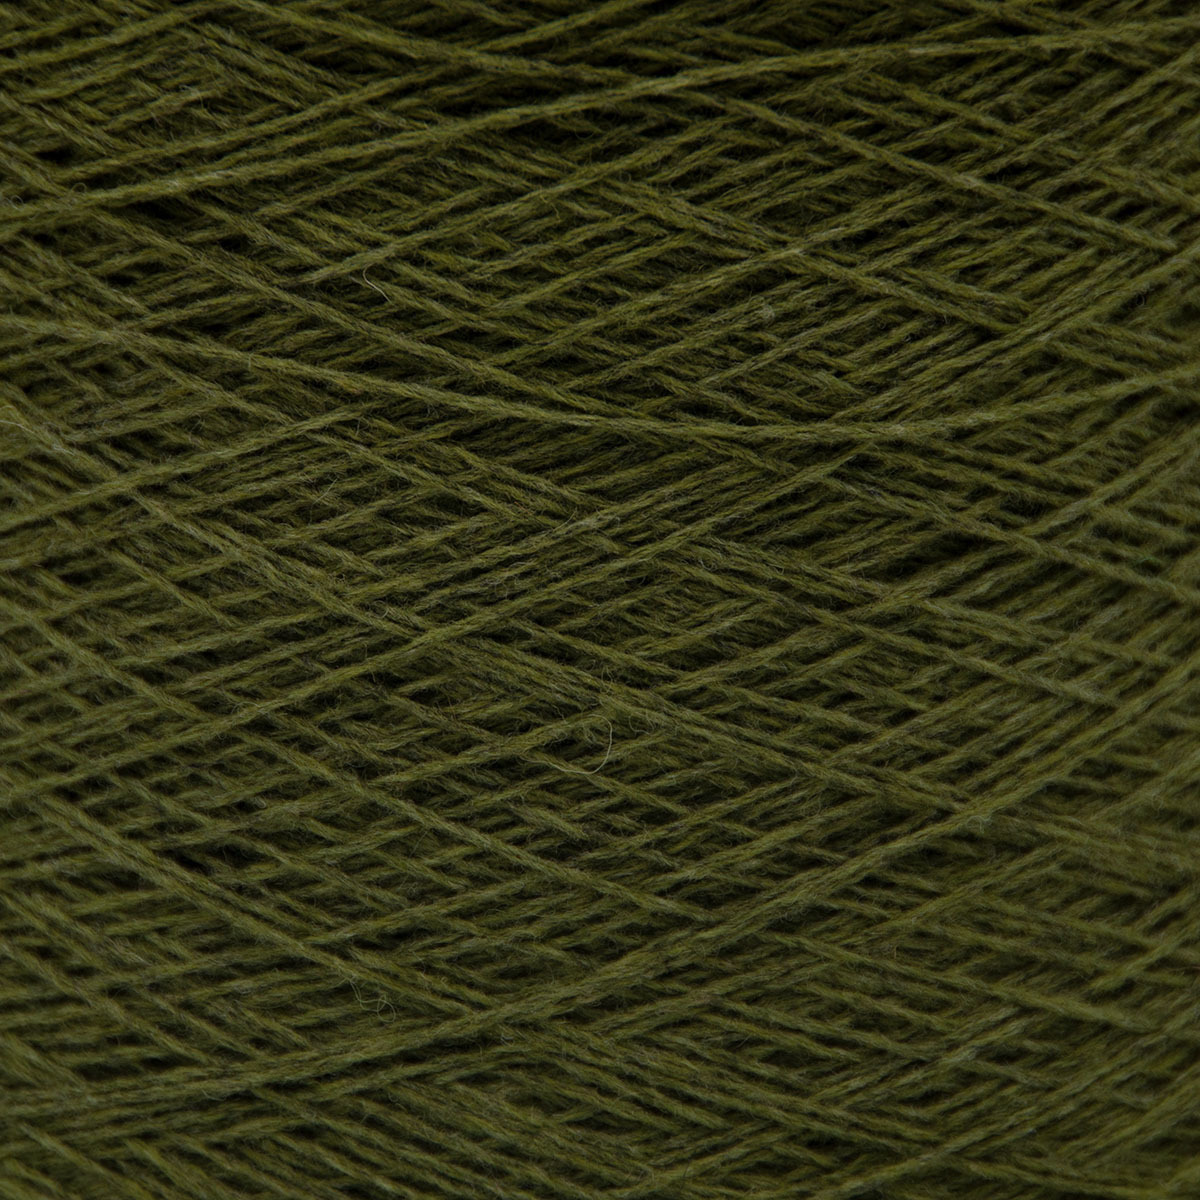 Knoll Yarns Merino Lambswool - 350